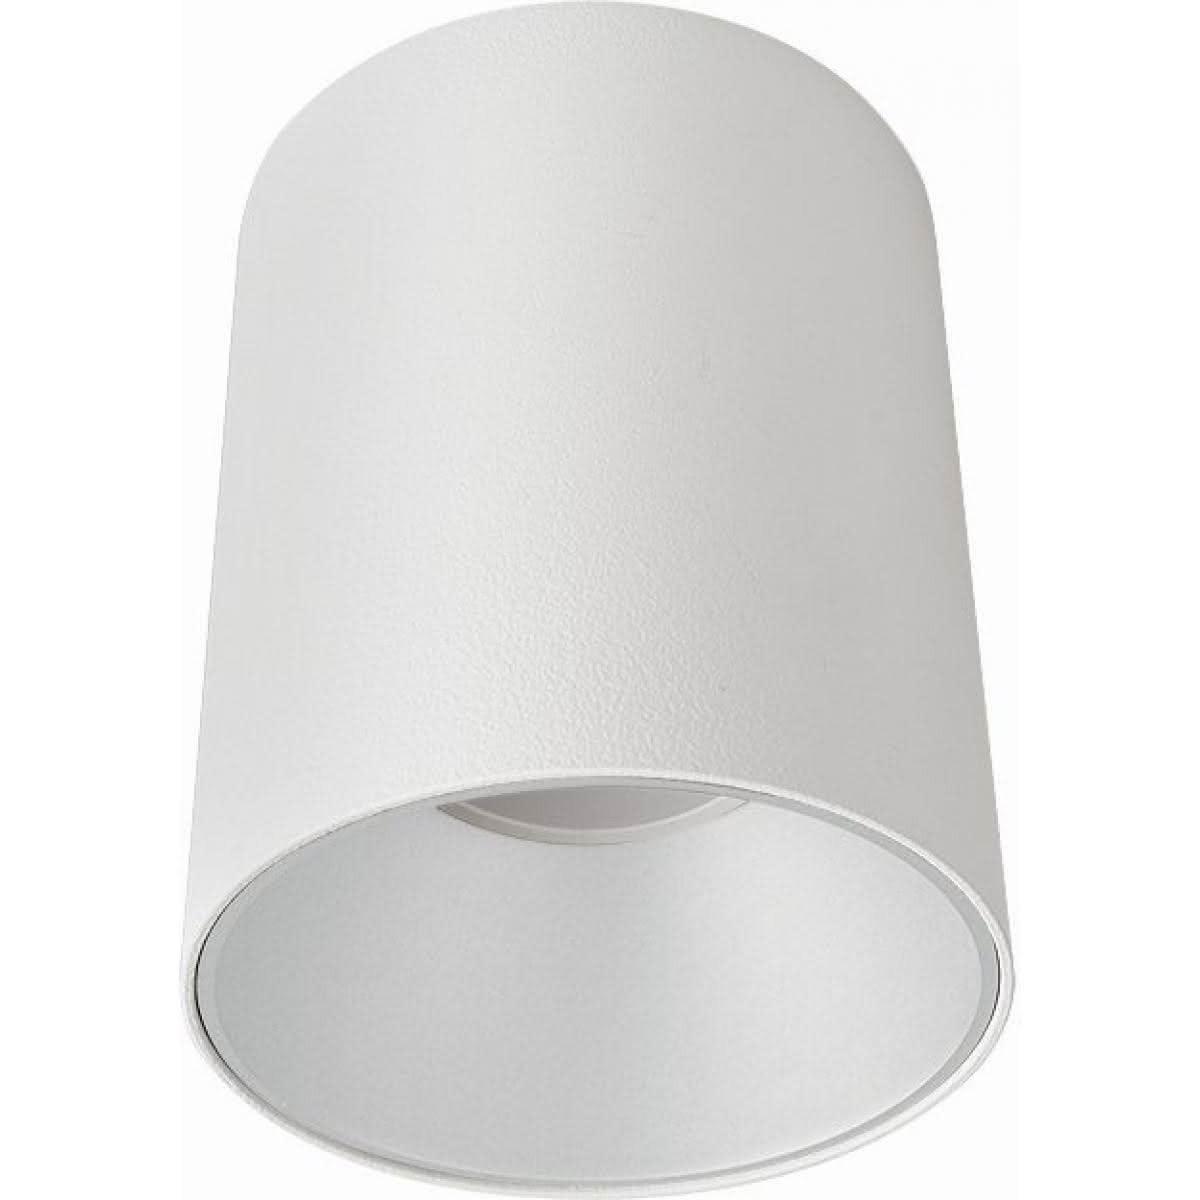 Nowodvorski EYE TONE colore bianco  1 x GU10 max 10W, solo LED